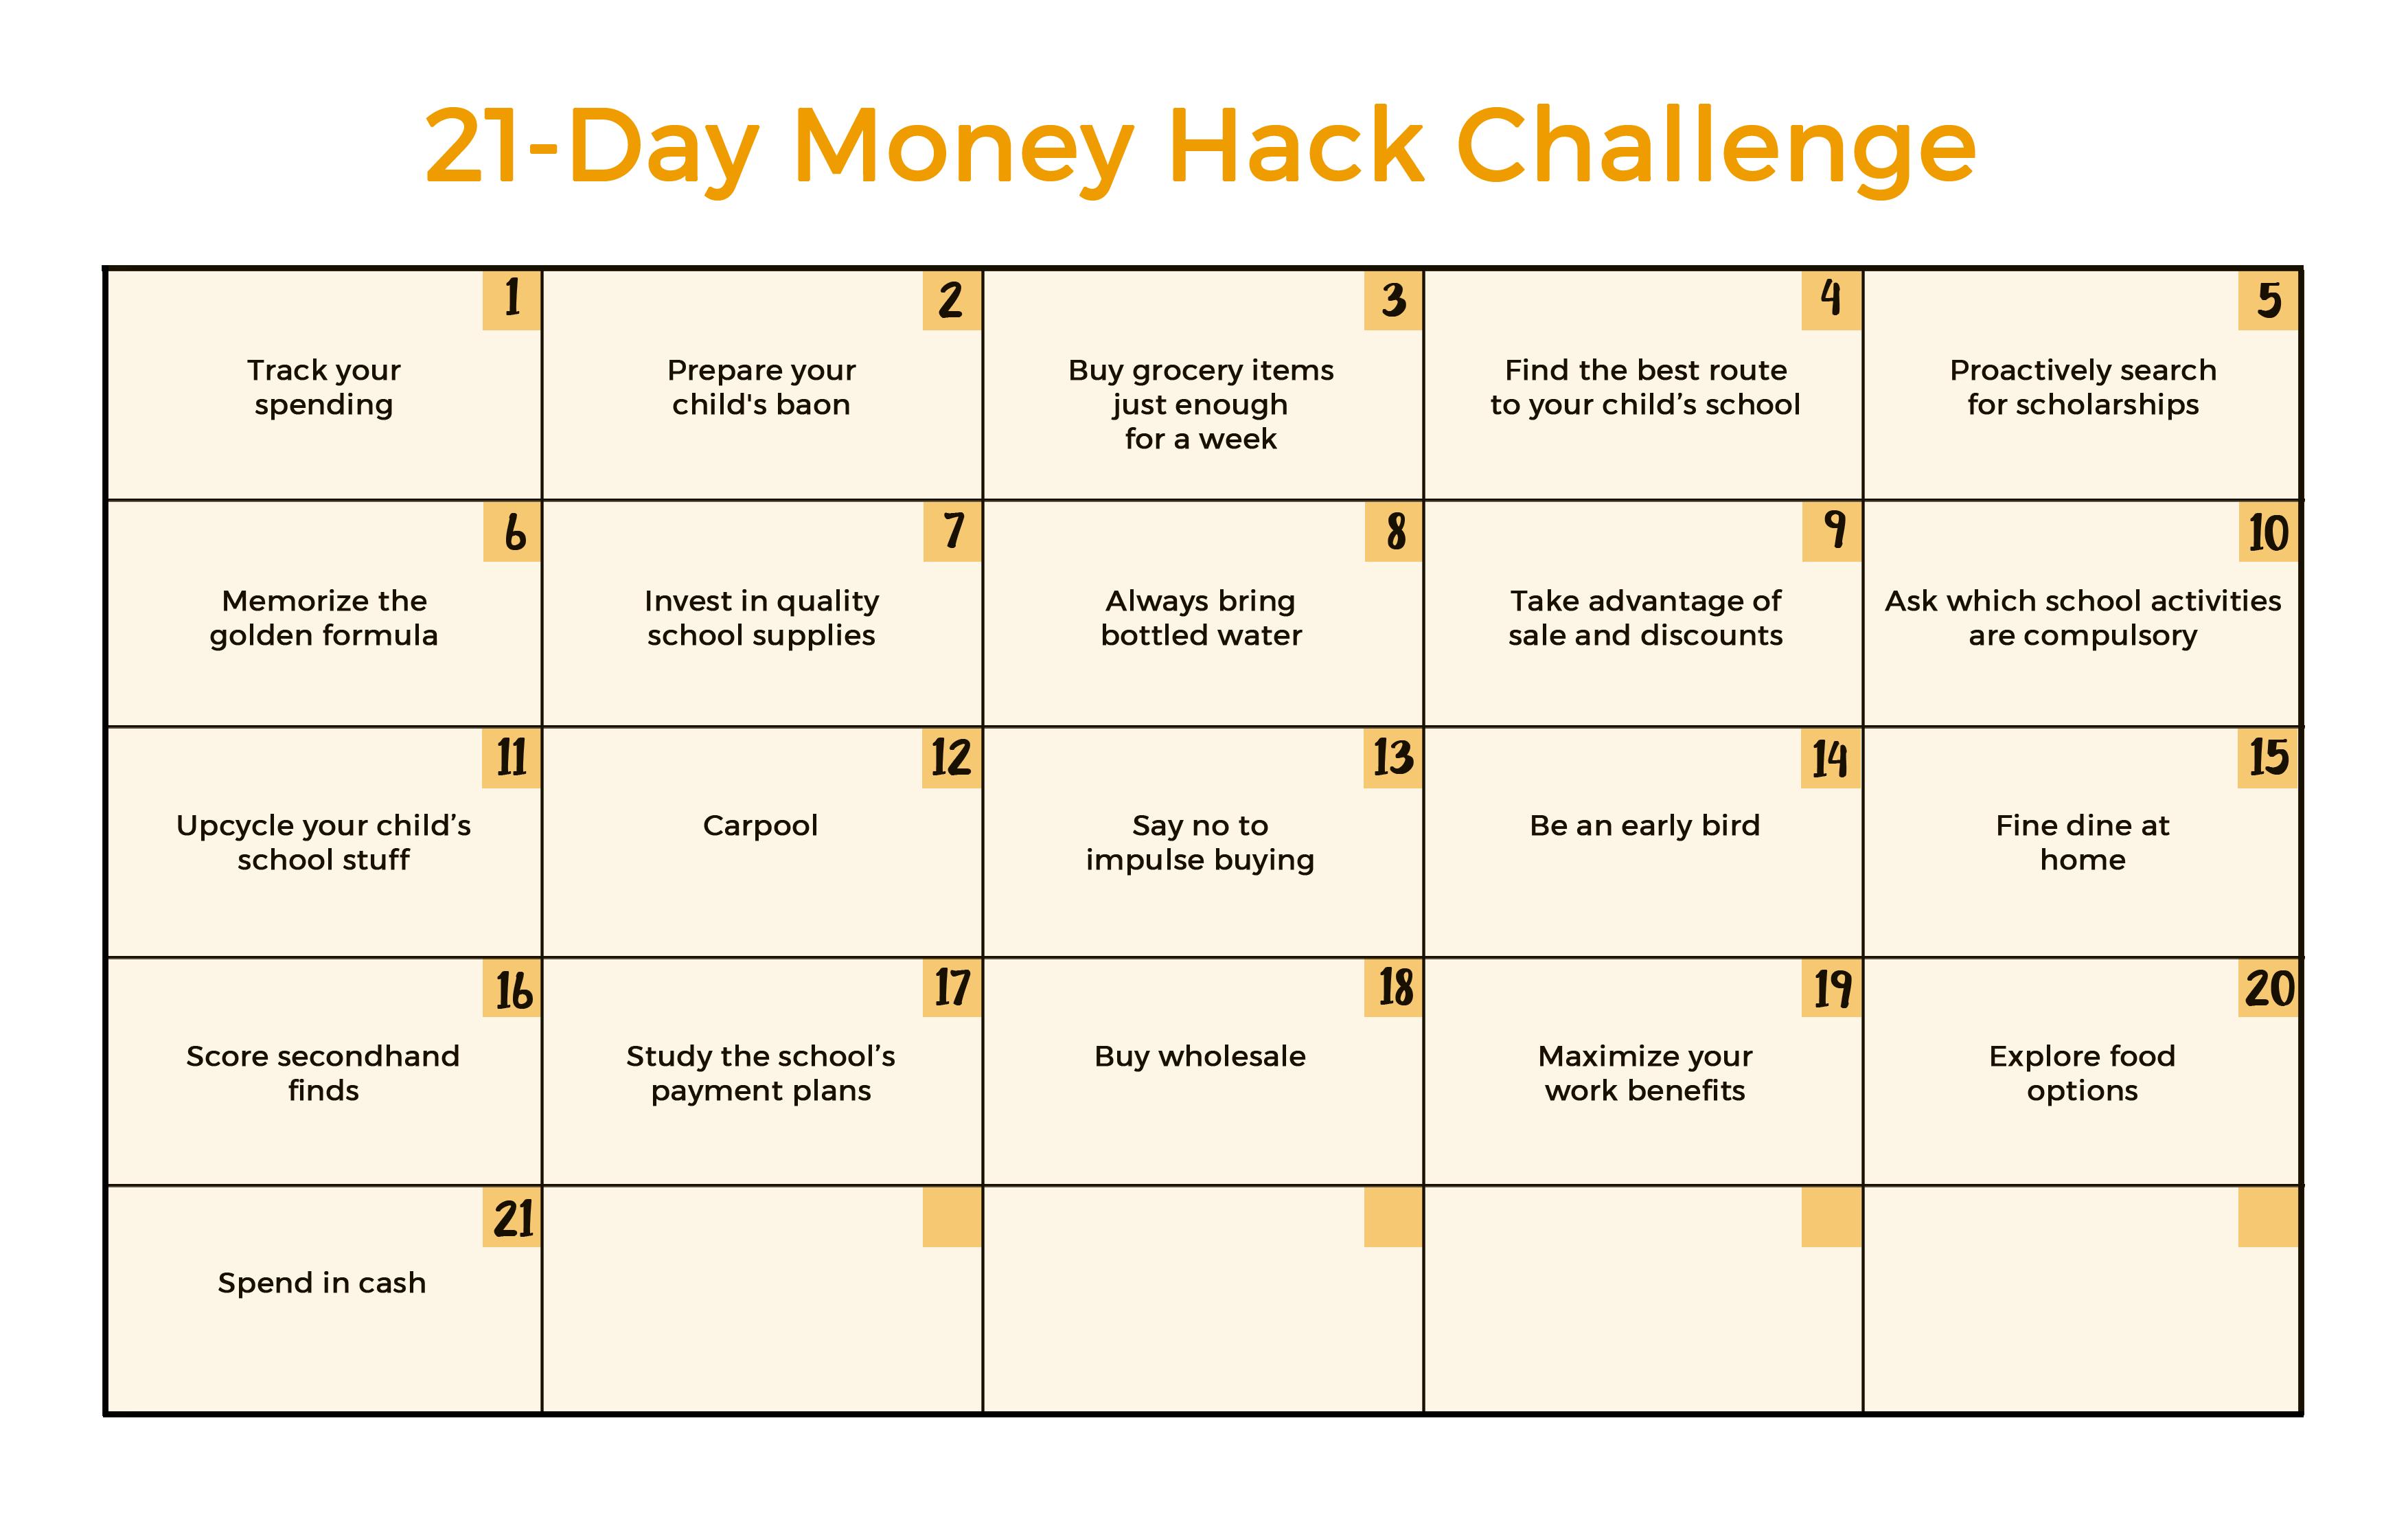 21-Day Money Hack Challenge